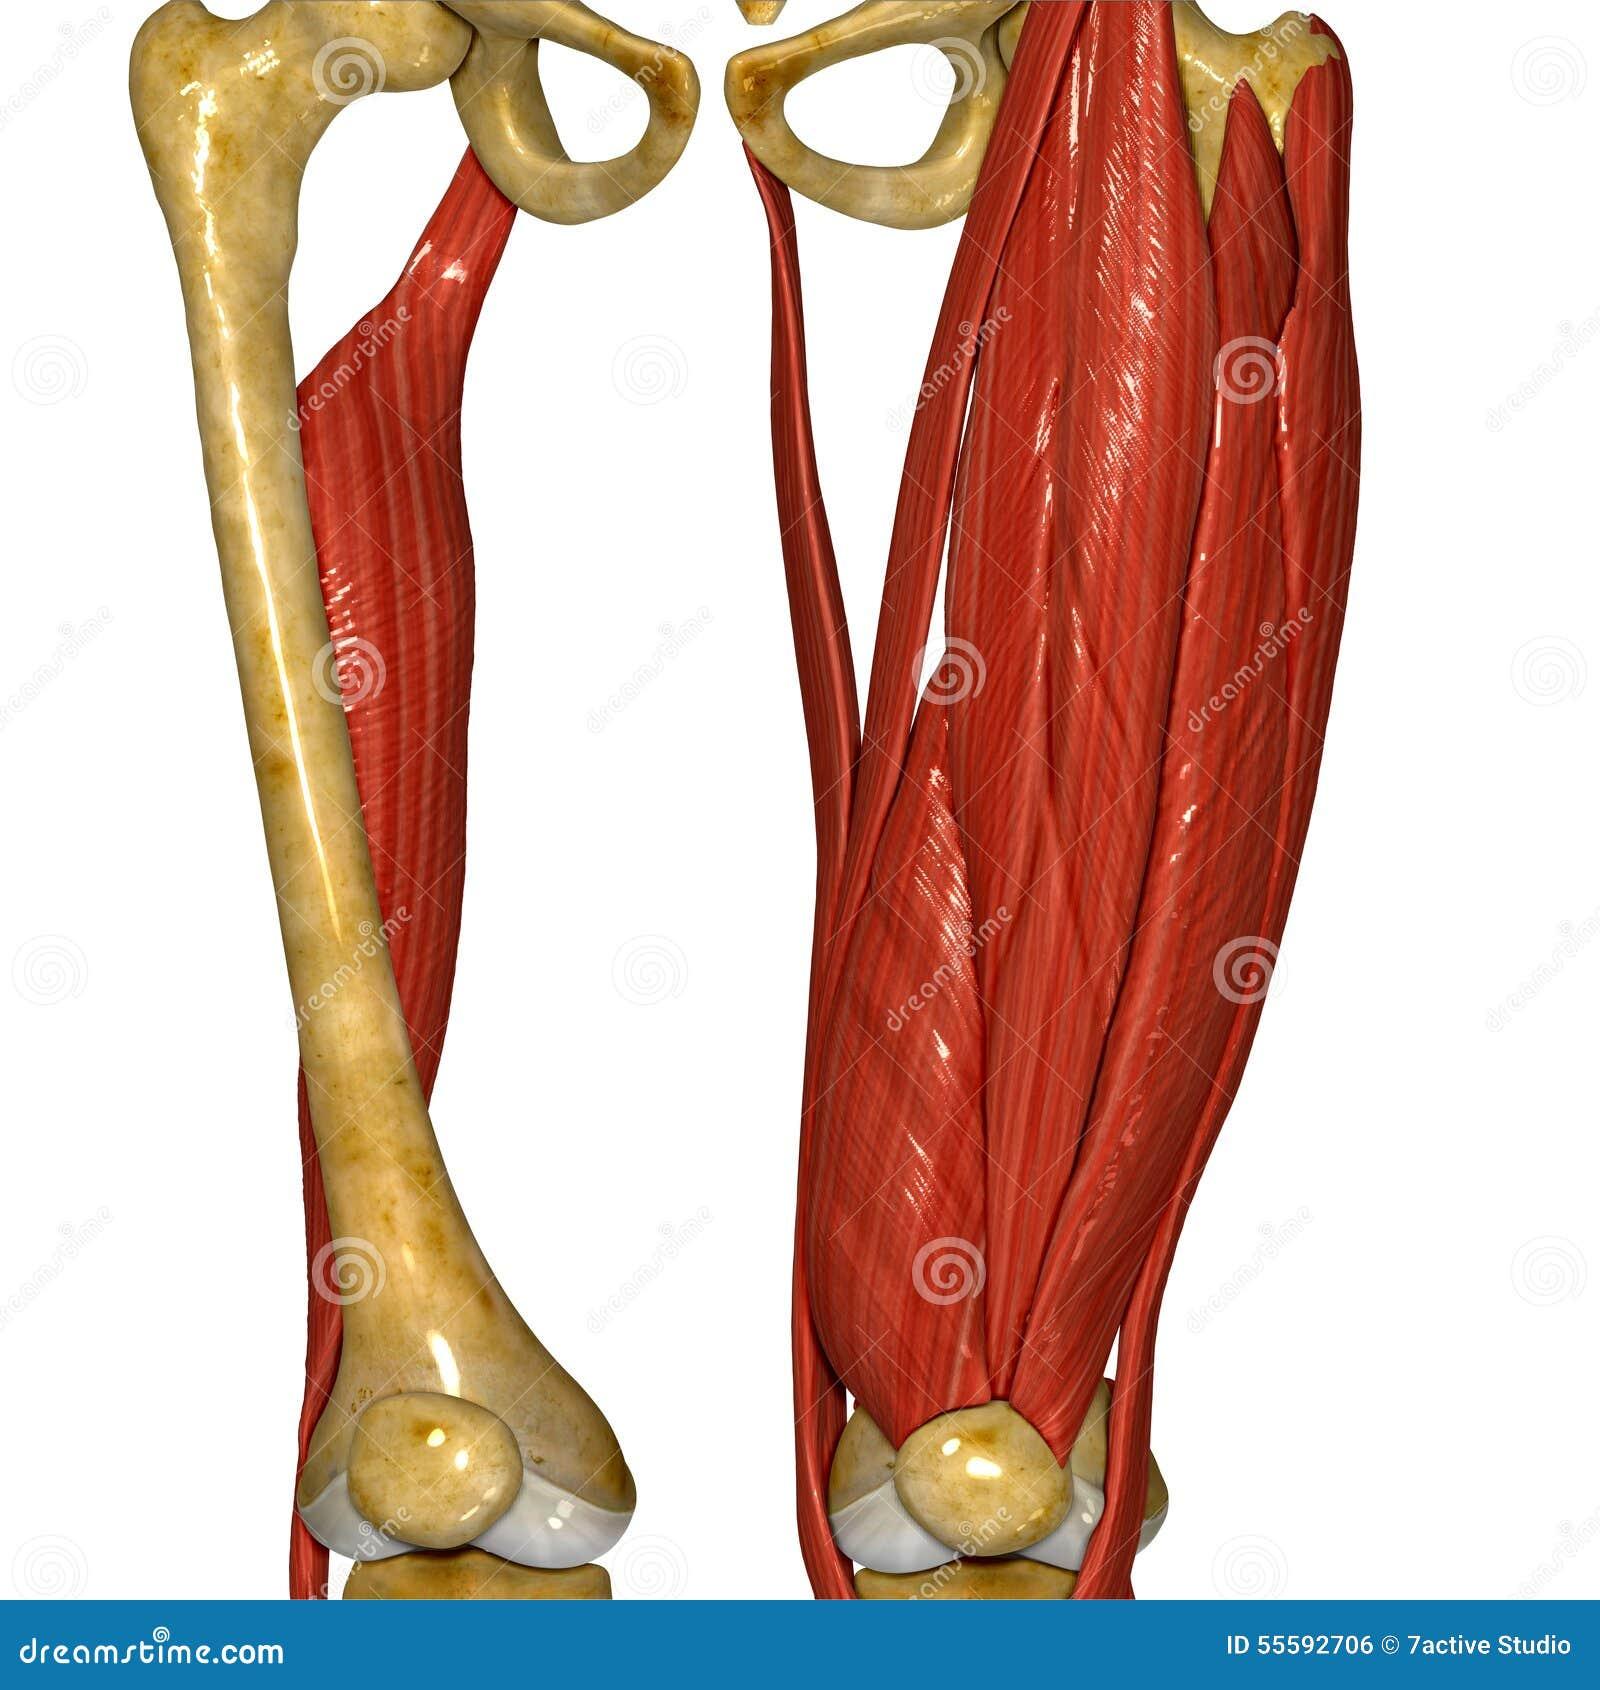 Thigh Muscle stock illustration. Illustration of pelvis - 55592706